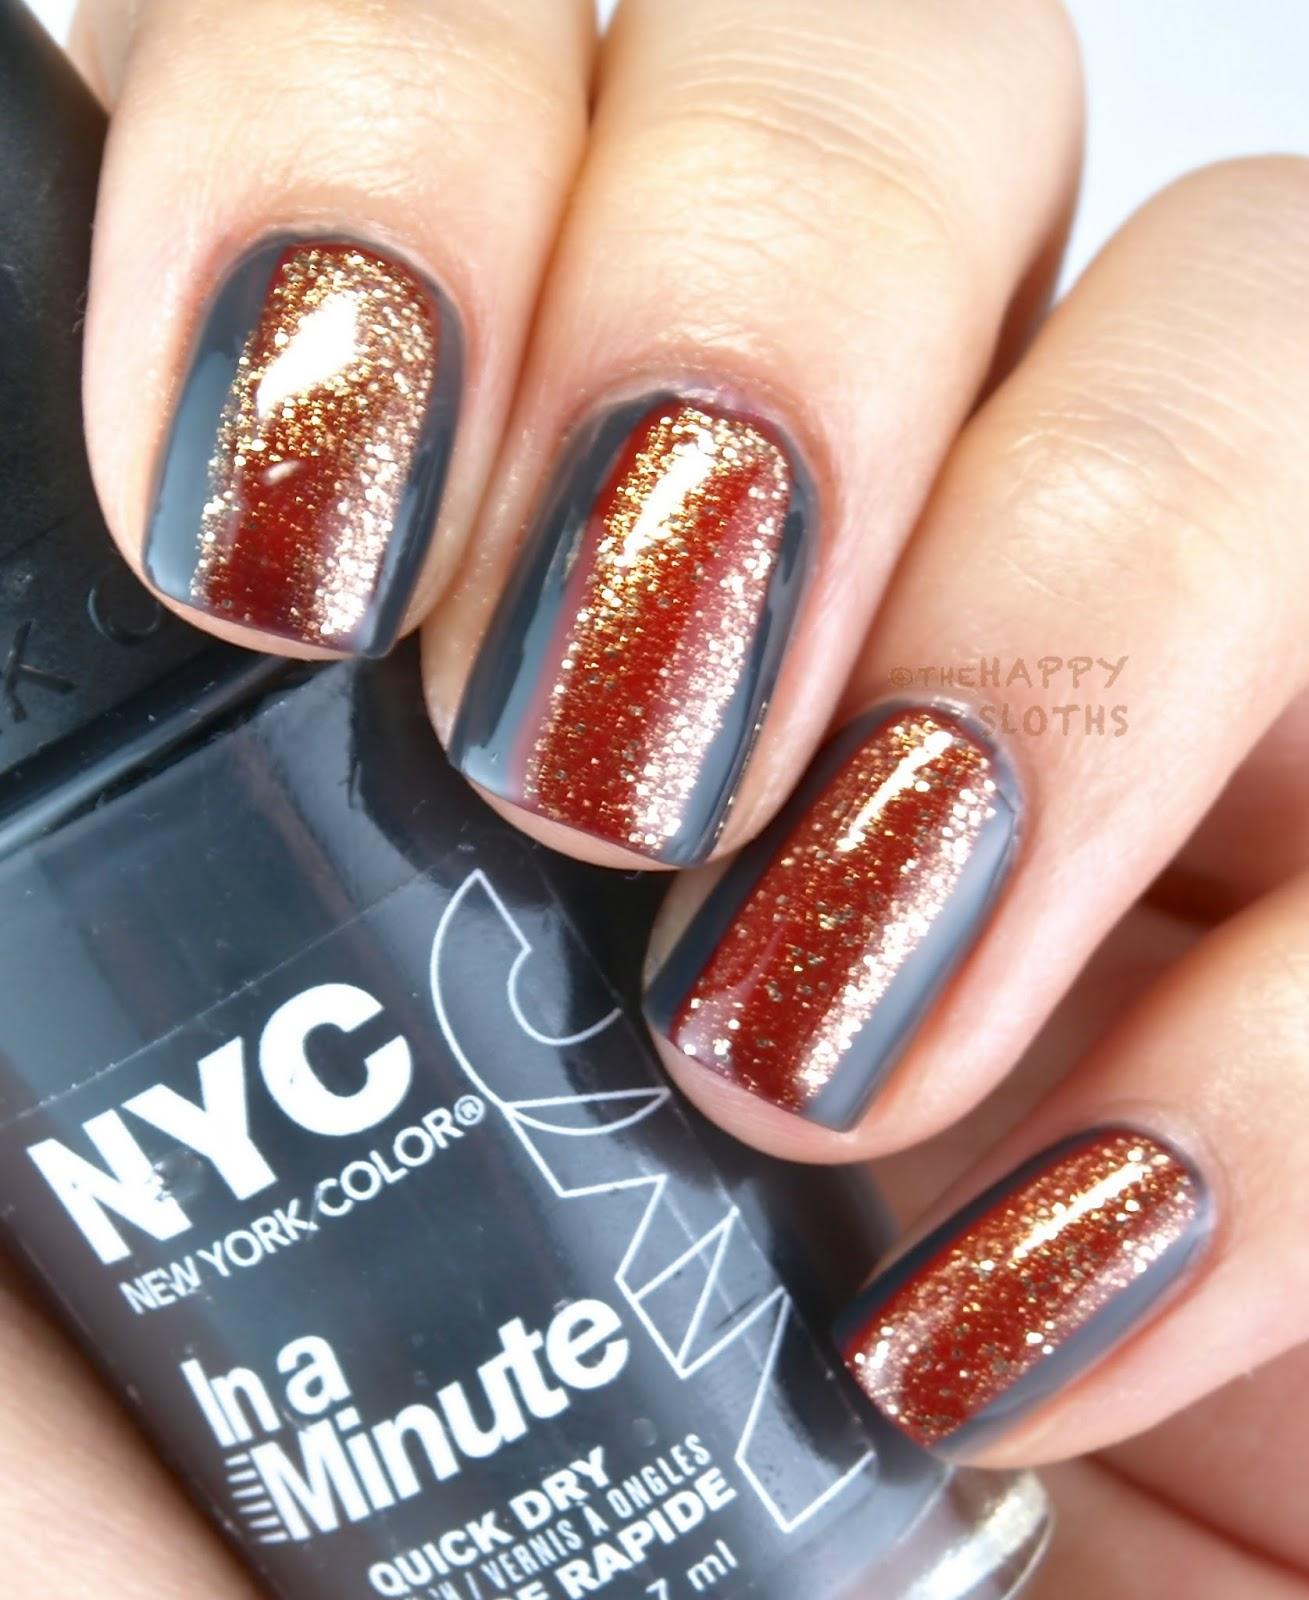 New York Inspired Nail Art: Polish hound nail art tracy reese nyfw ...